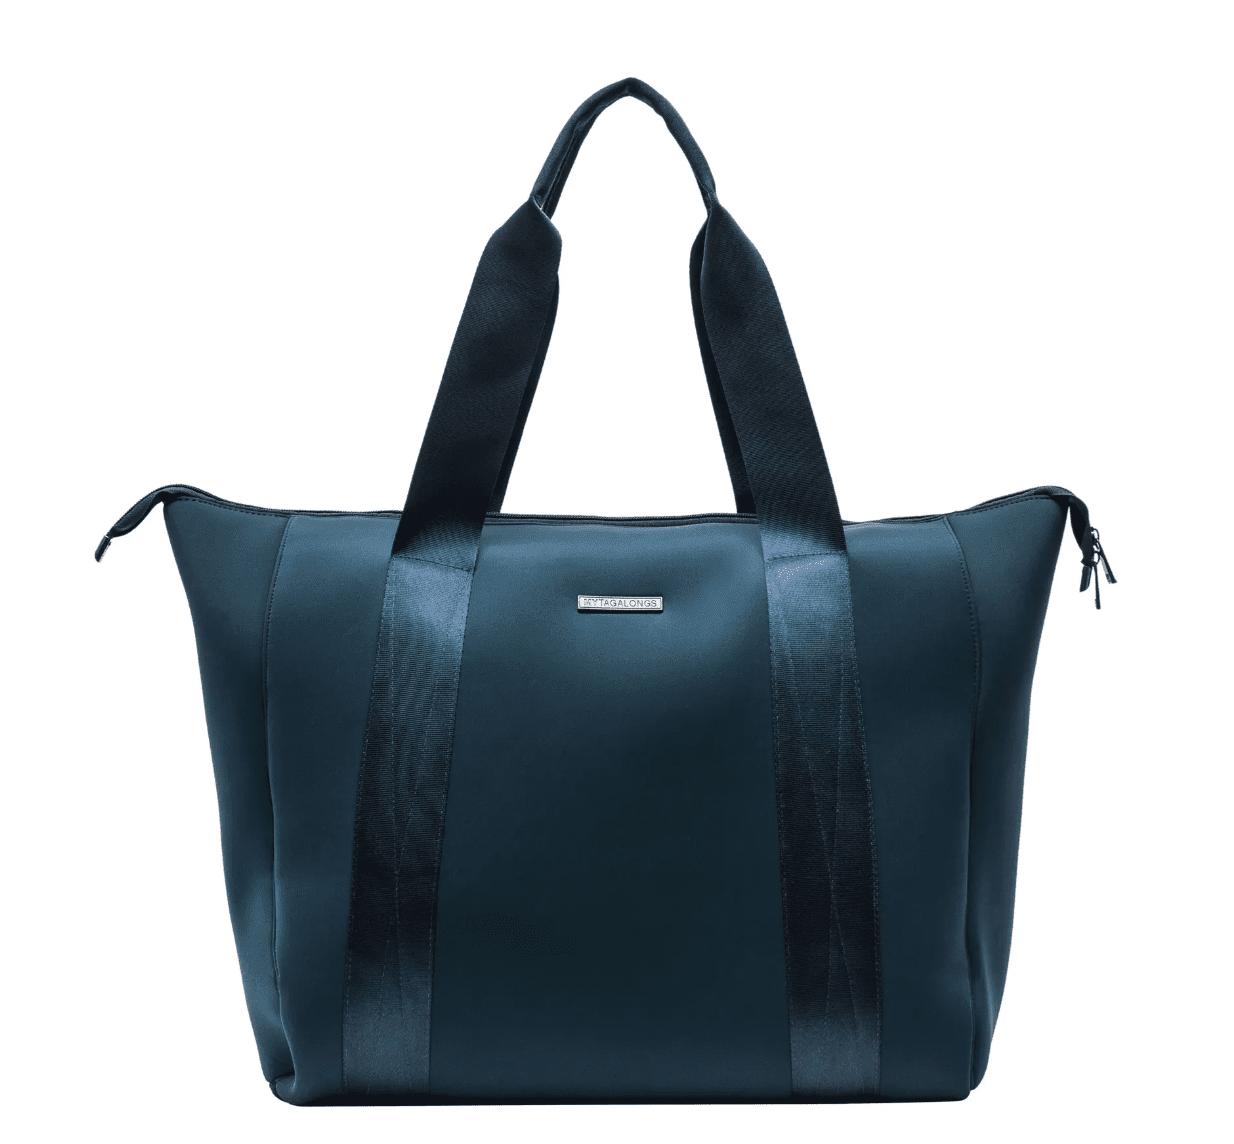 Everleigh Weekend Bag